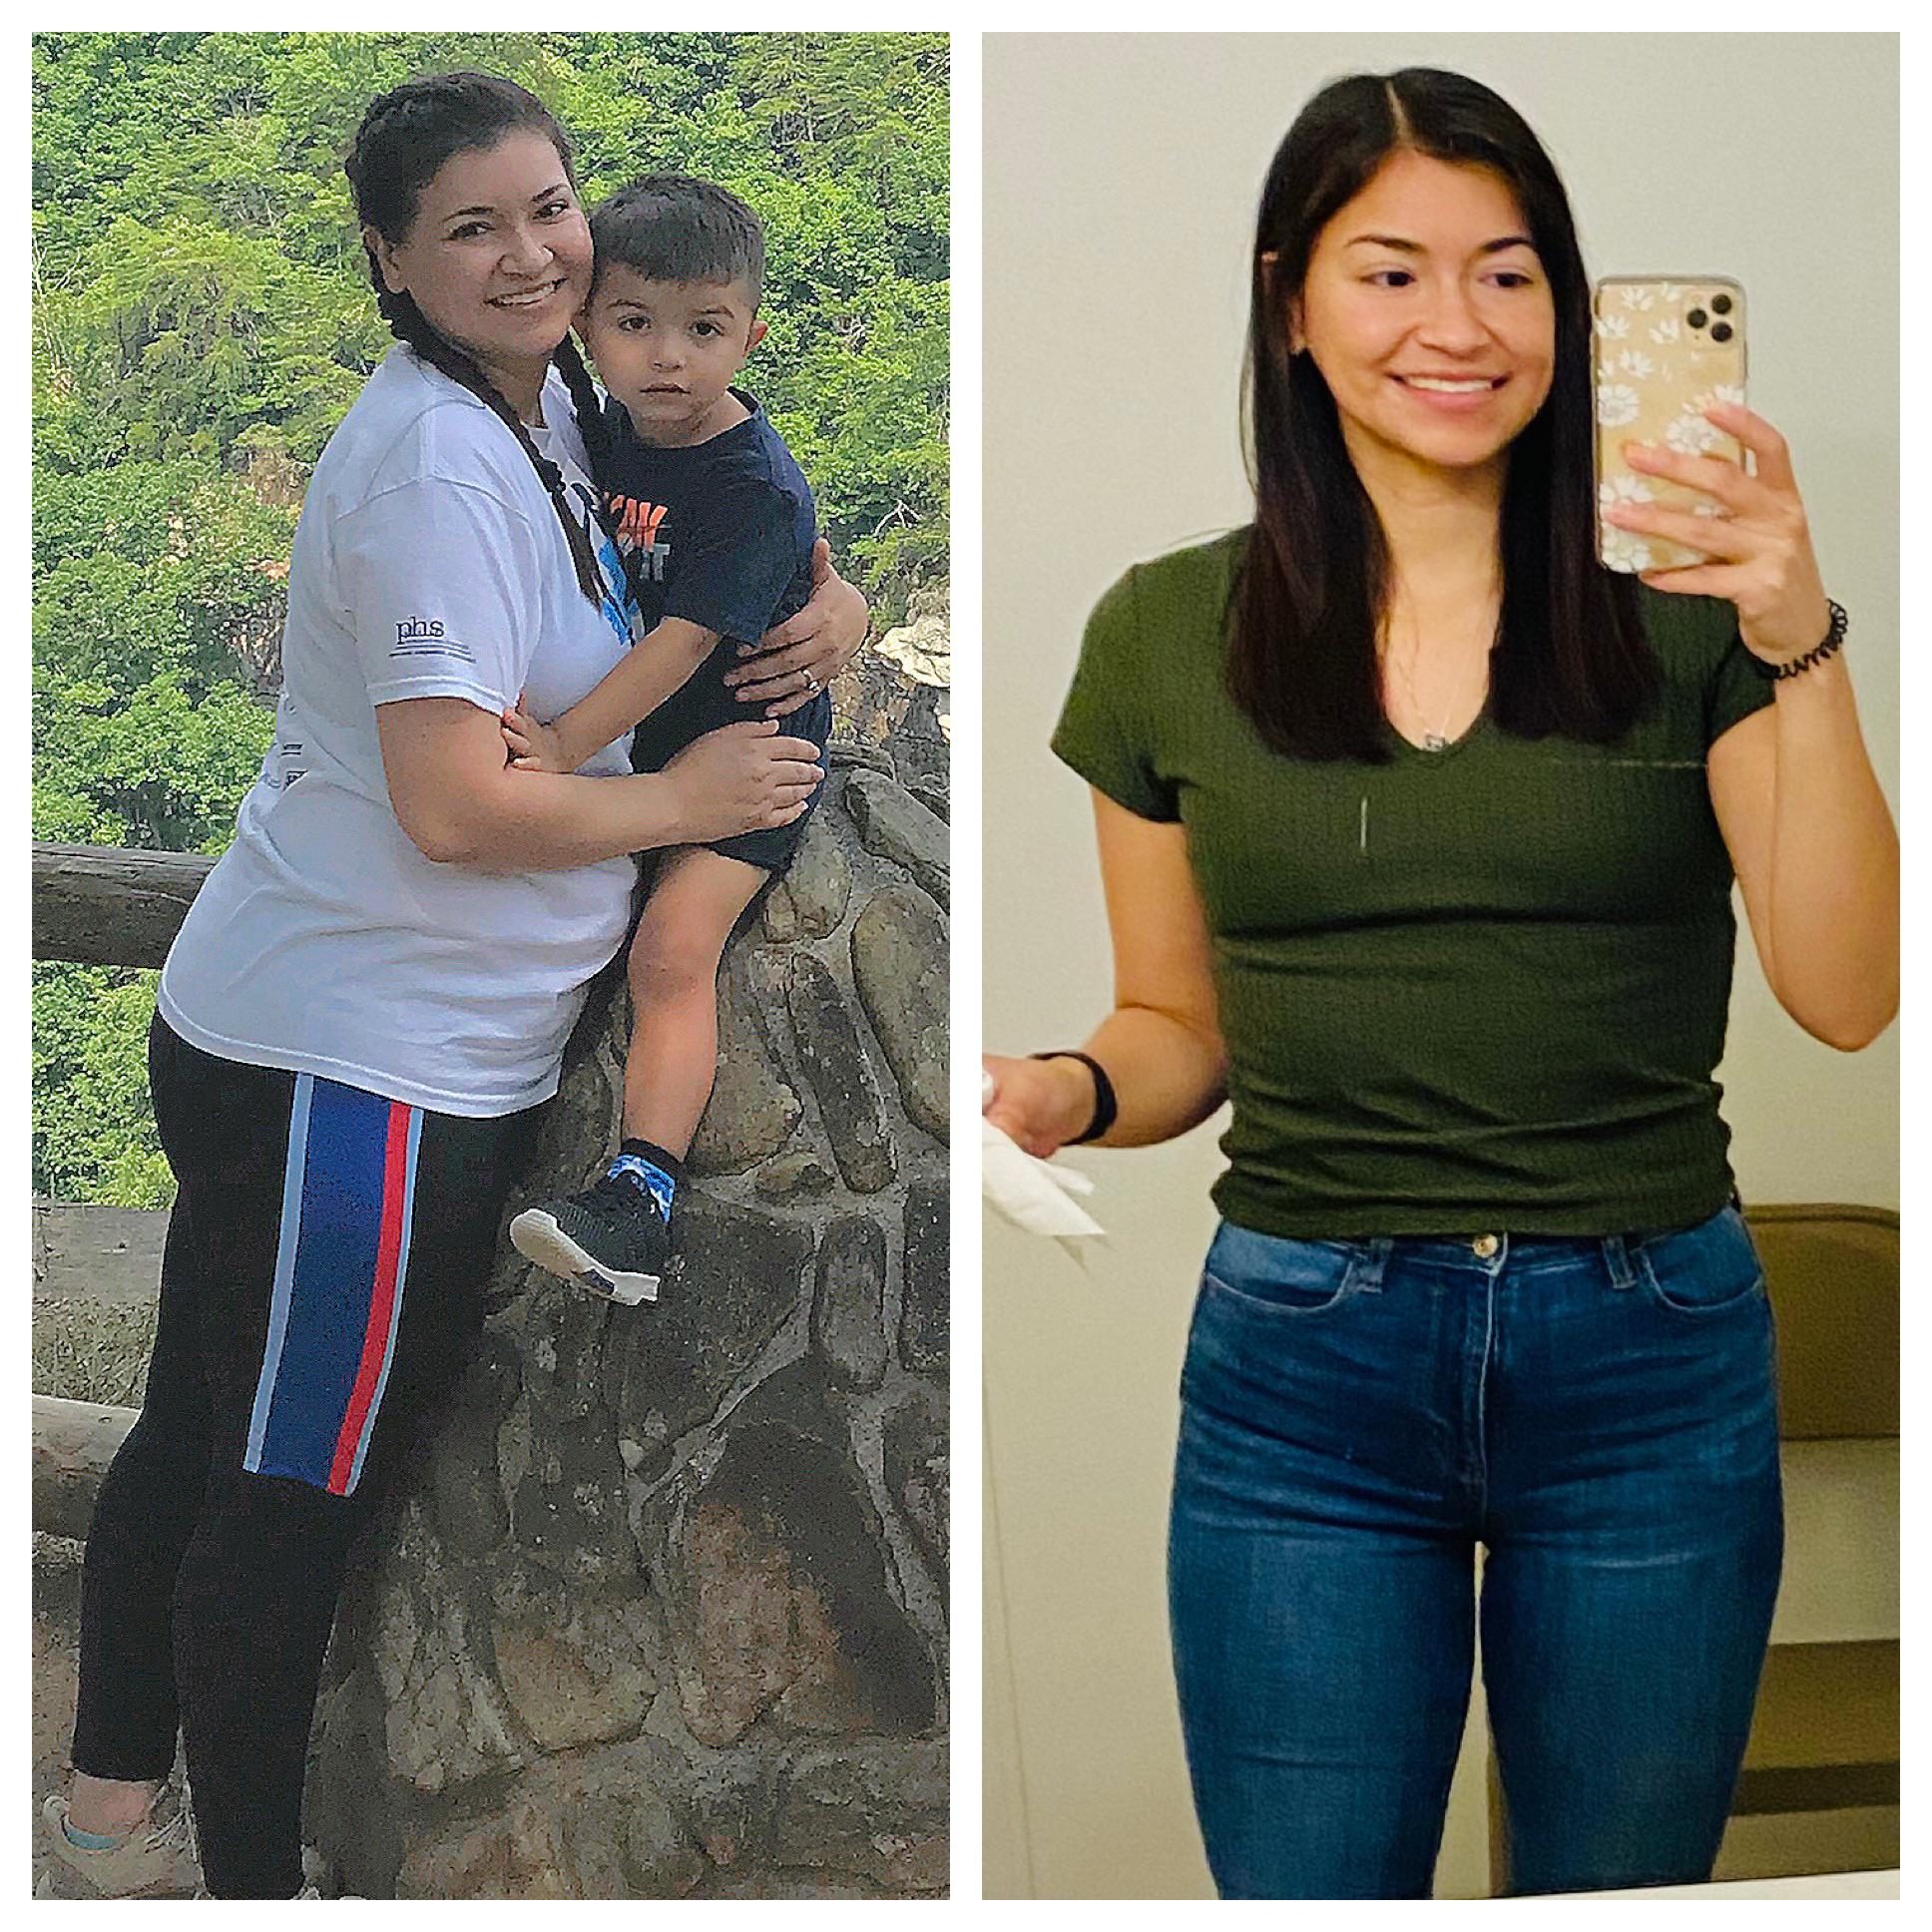 5 foot 5 Female Progress Pics of 60 lbs Weight Loss 200 lbs to 140 lbs